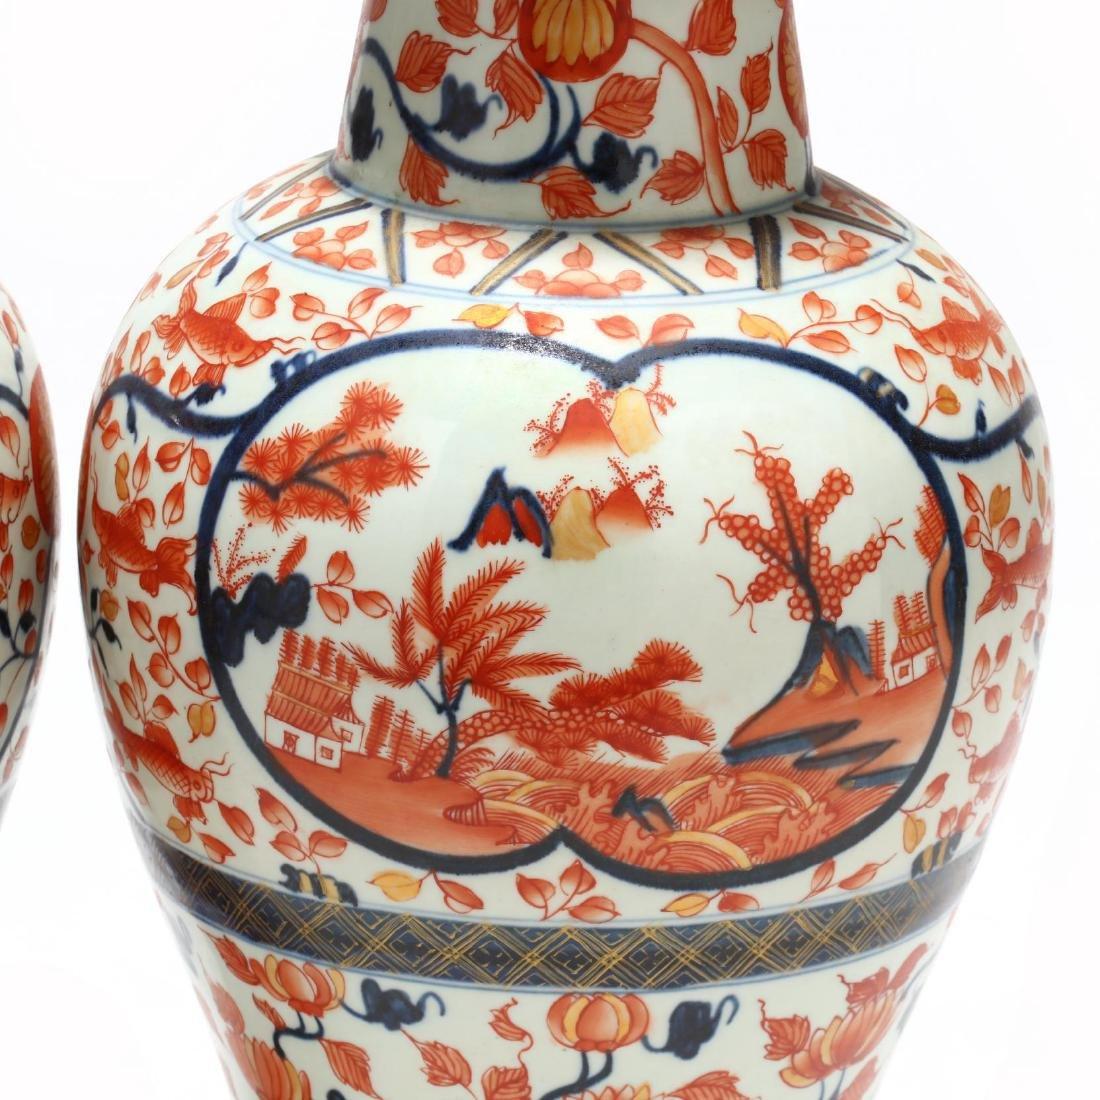 A Pair of Japanese Imari Covered Jars - 5